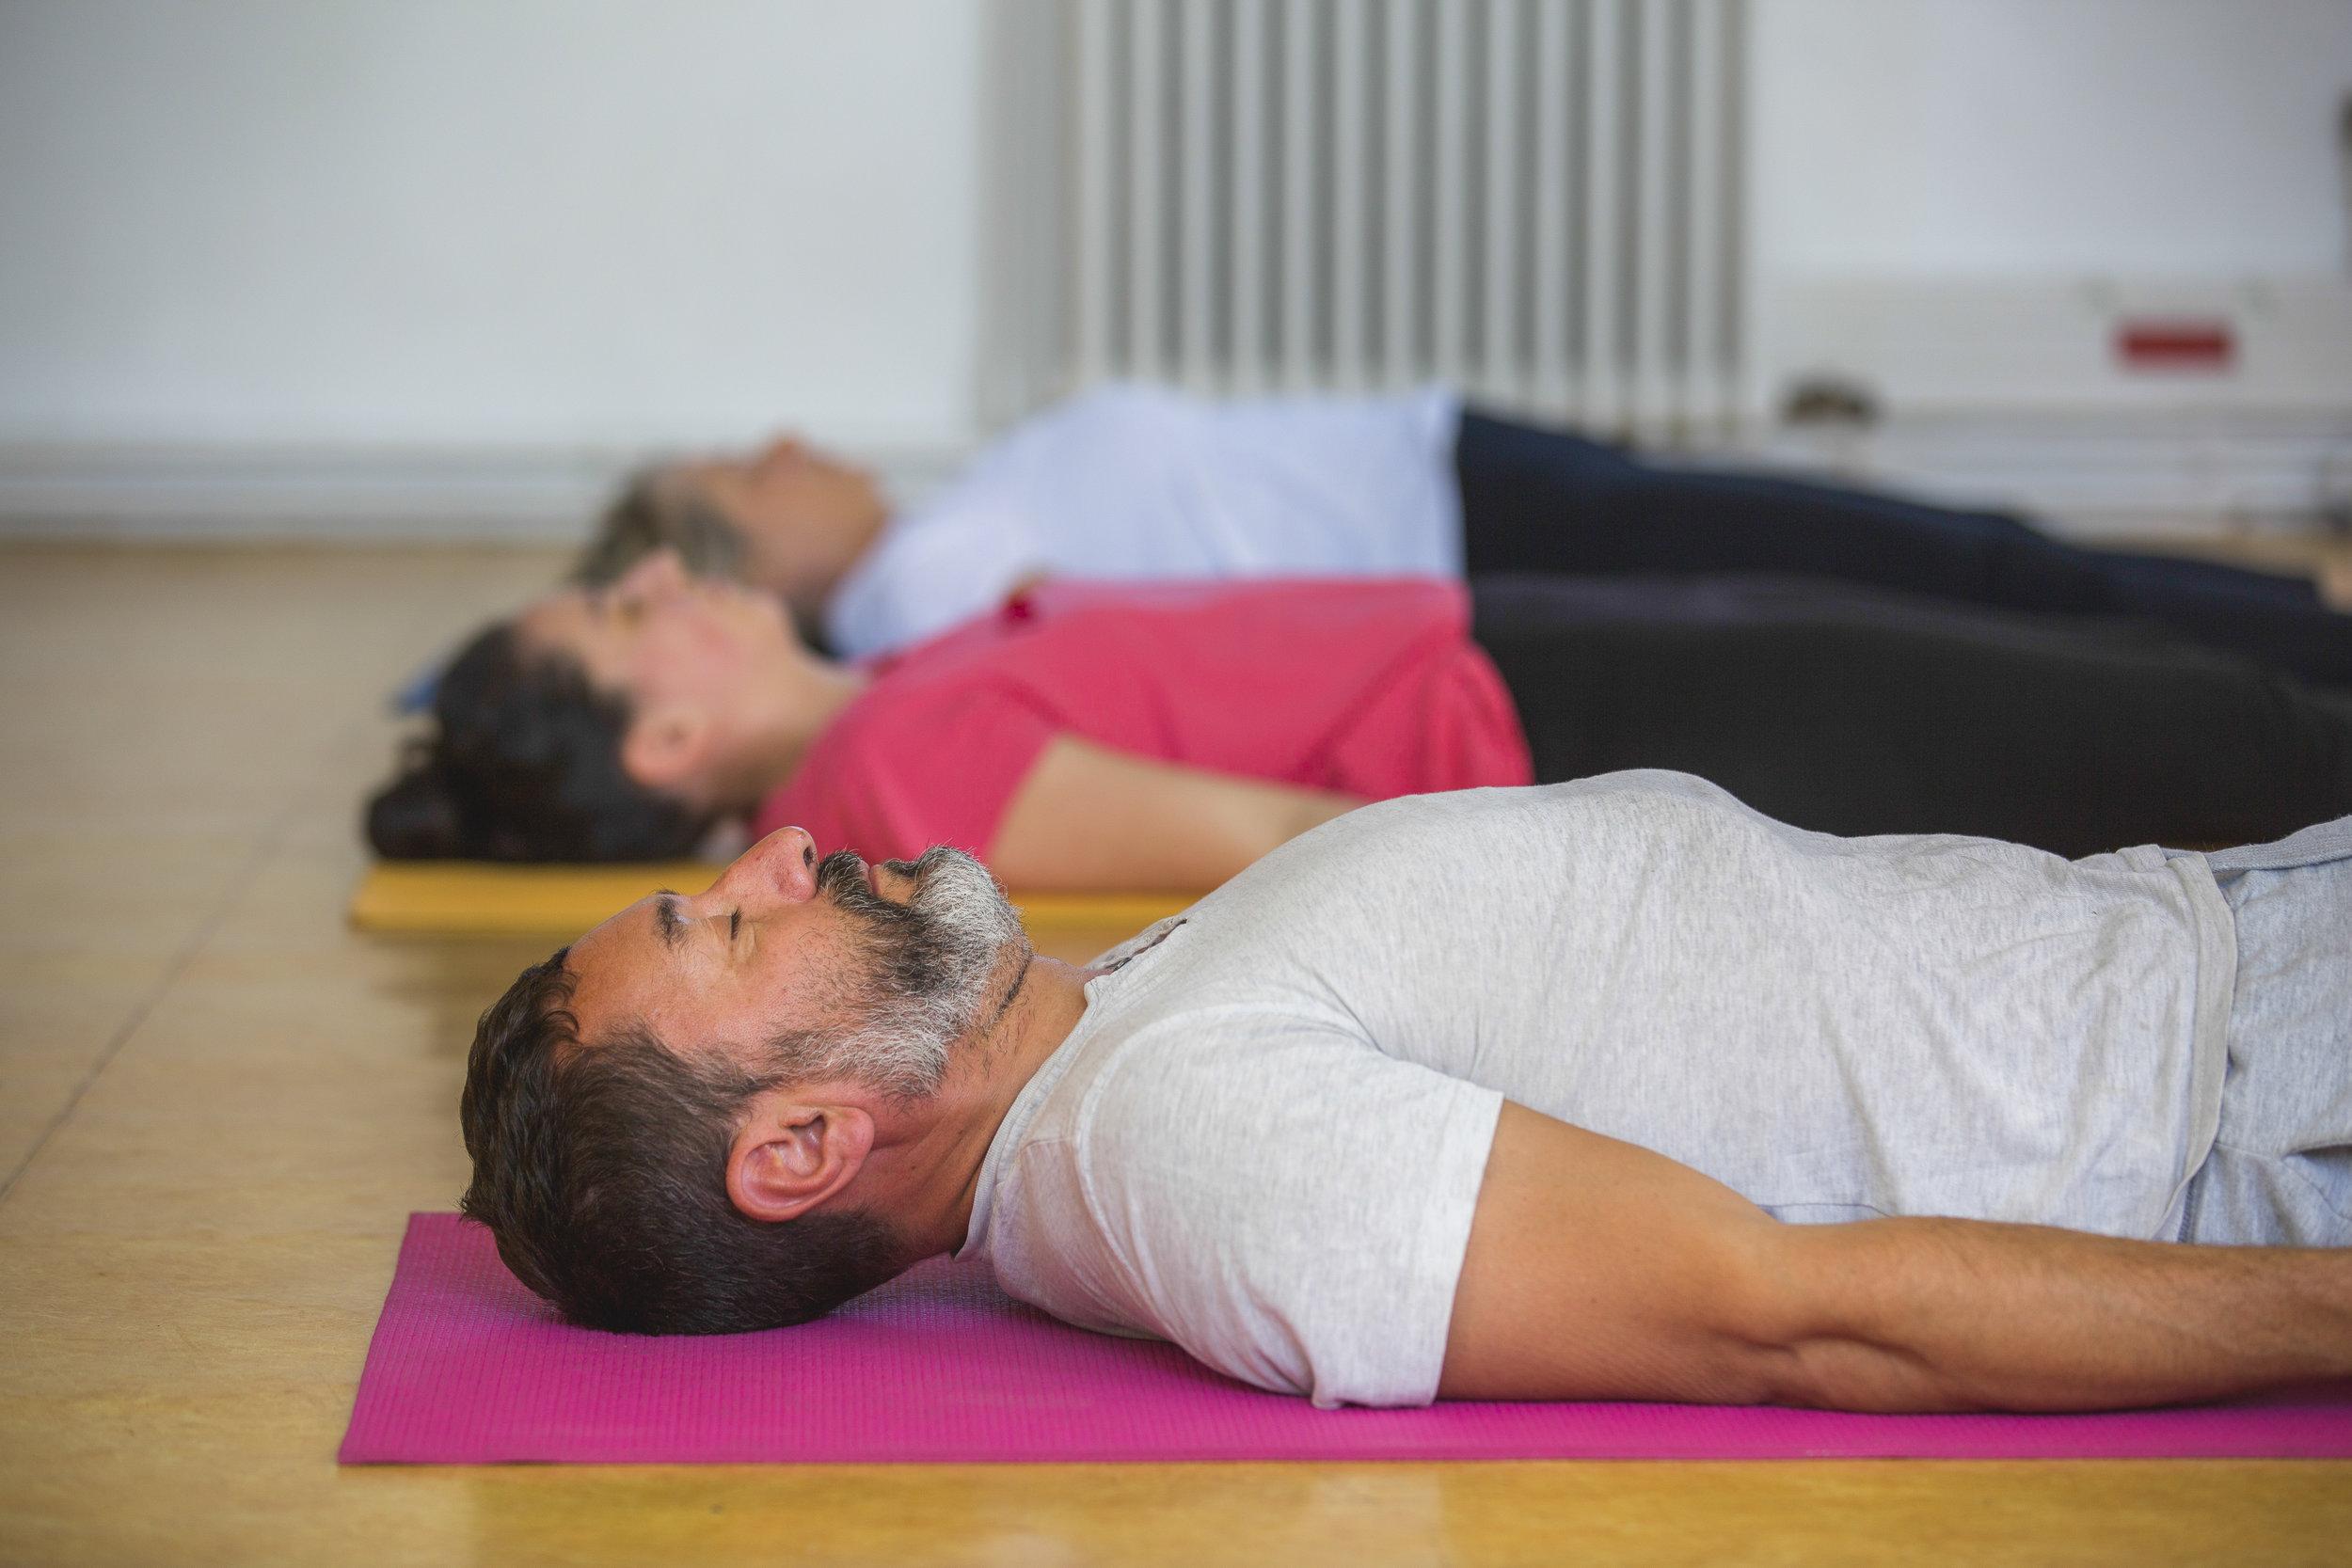 fontenay-sous-bois-yoga-meditation.jpg